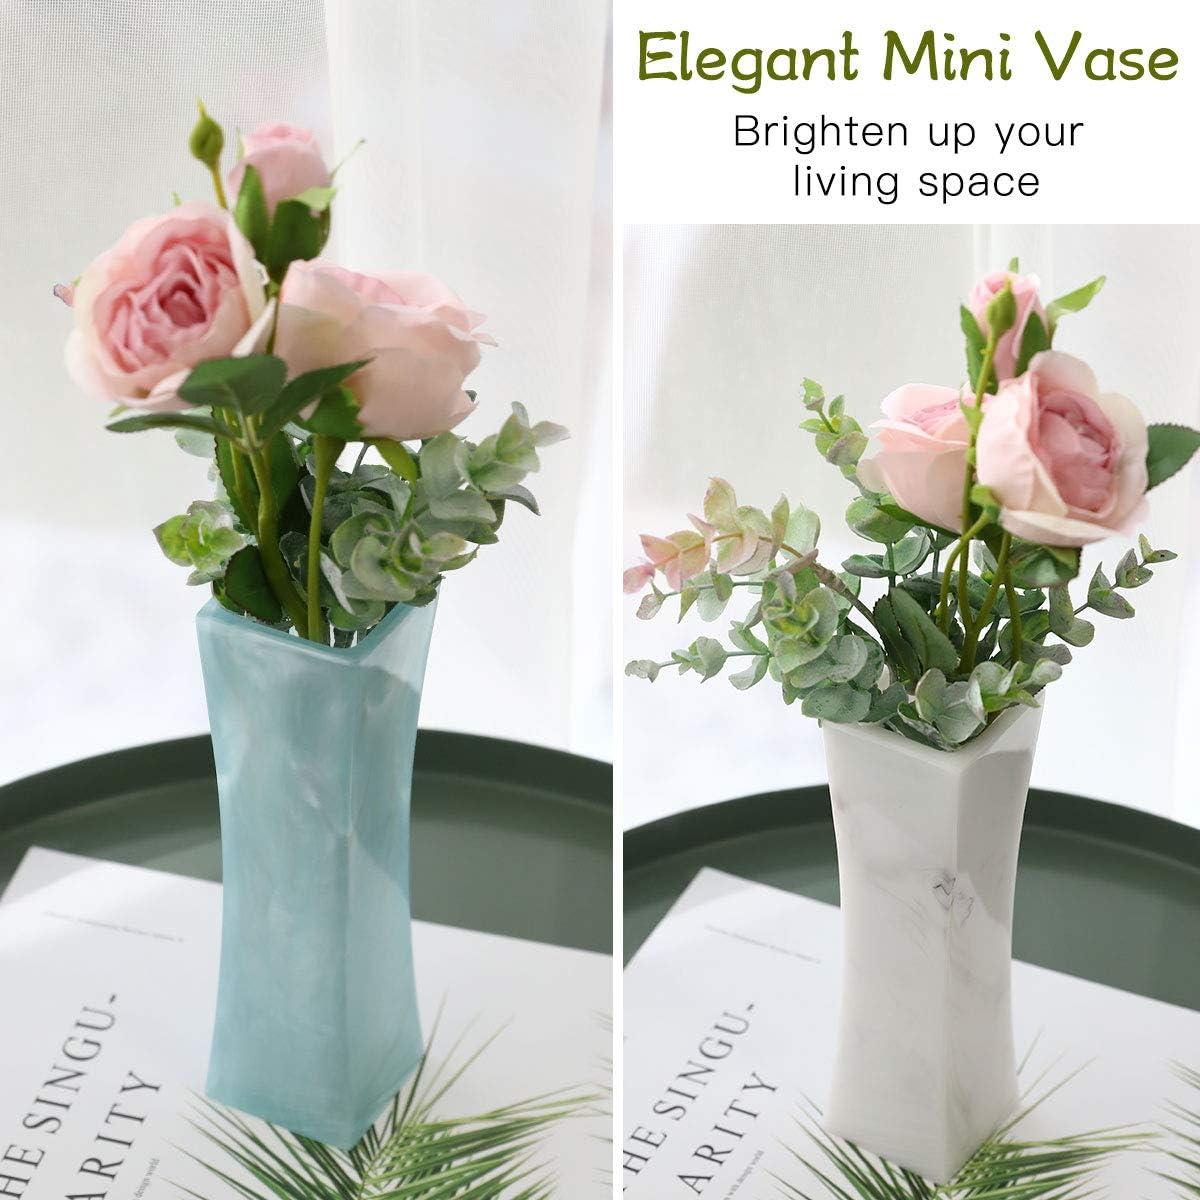 Gift Box Packed -Grey Pearl+White Pearl 2 Pack 7.1 Inch Elegant Curved Shaped Vase Flower Vase for Home Living Room Study Room Dining Room Tabletop Improvement Decor Lewondr Decorative Resin Vase,